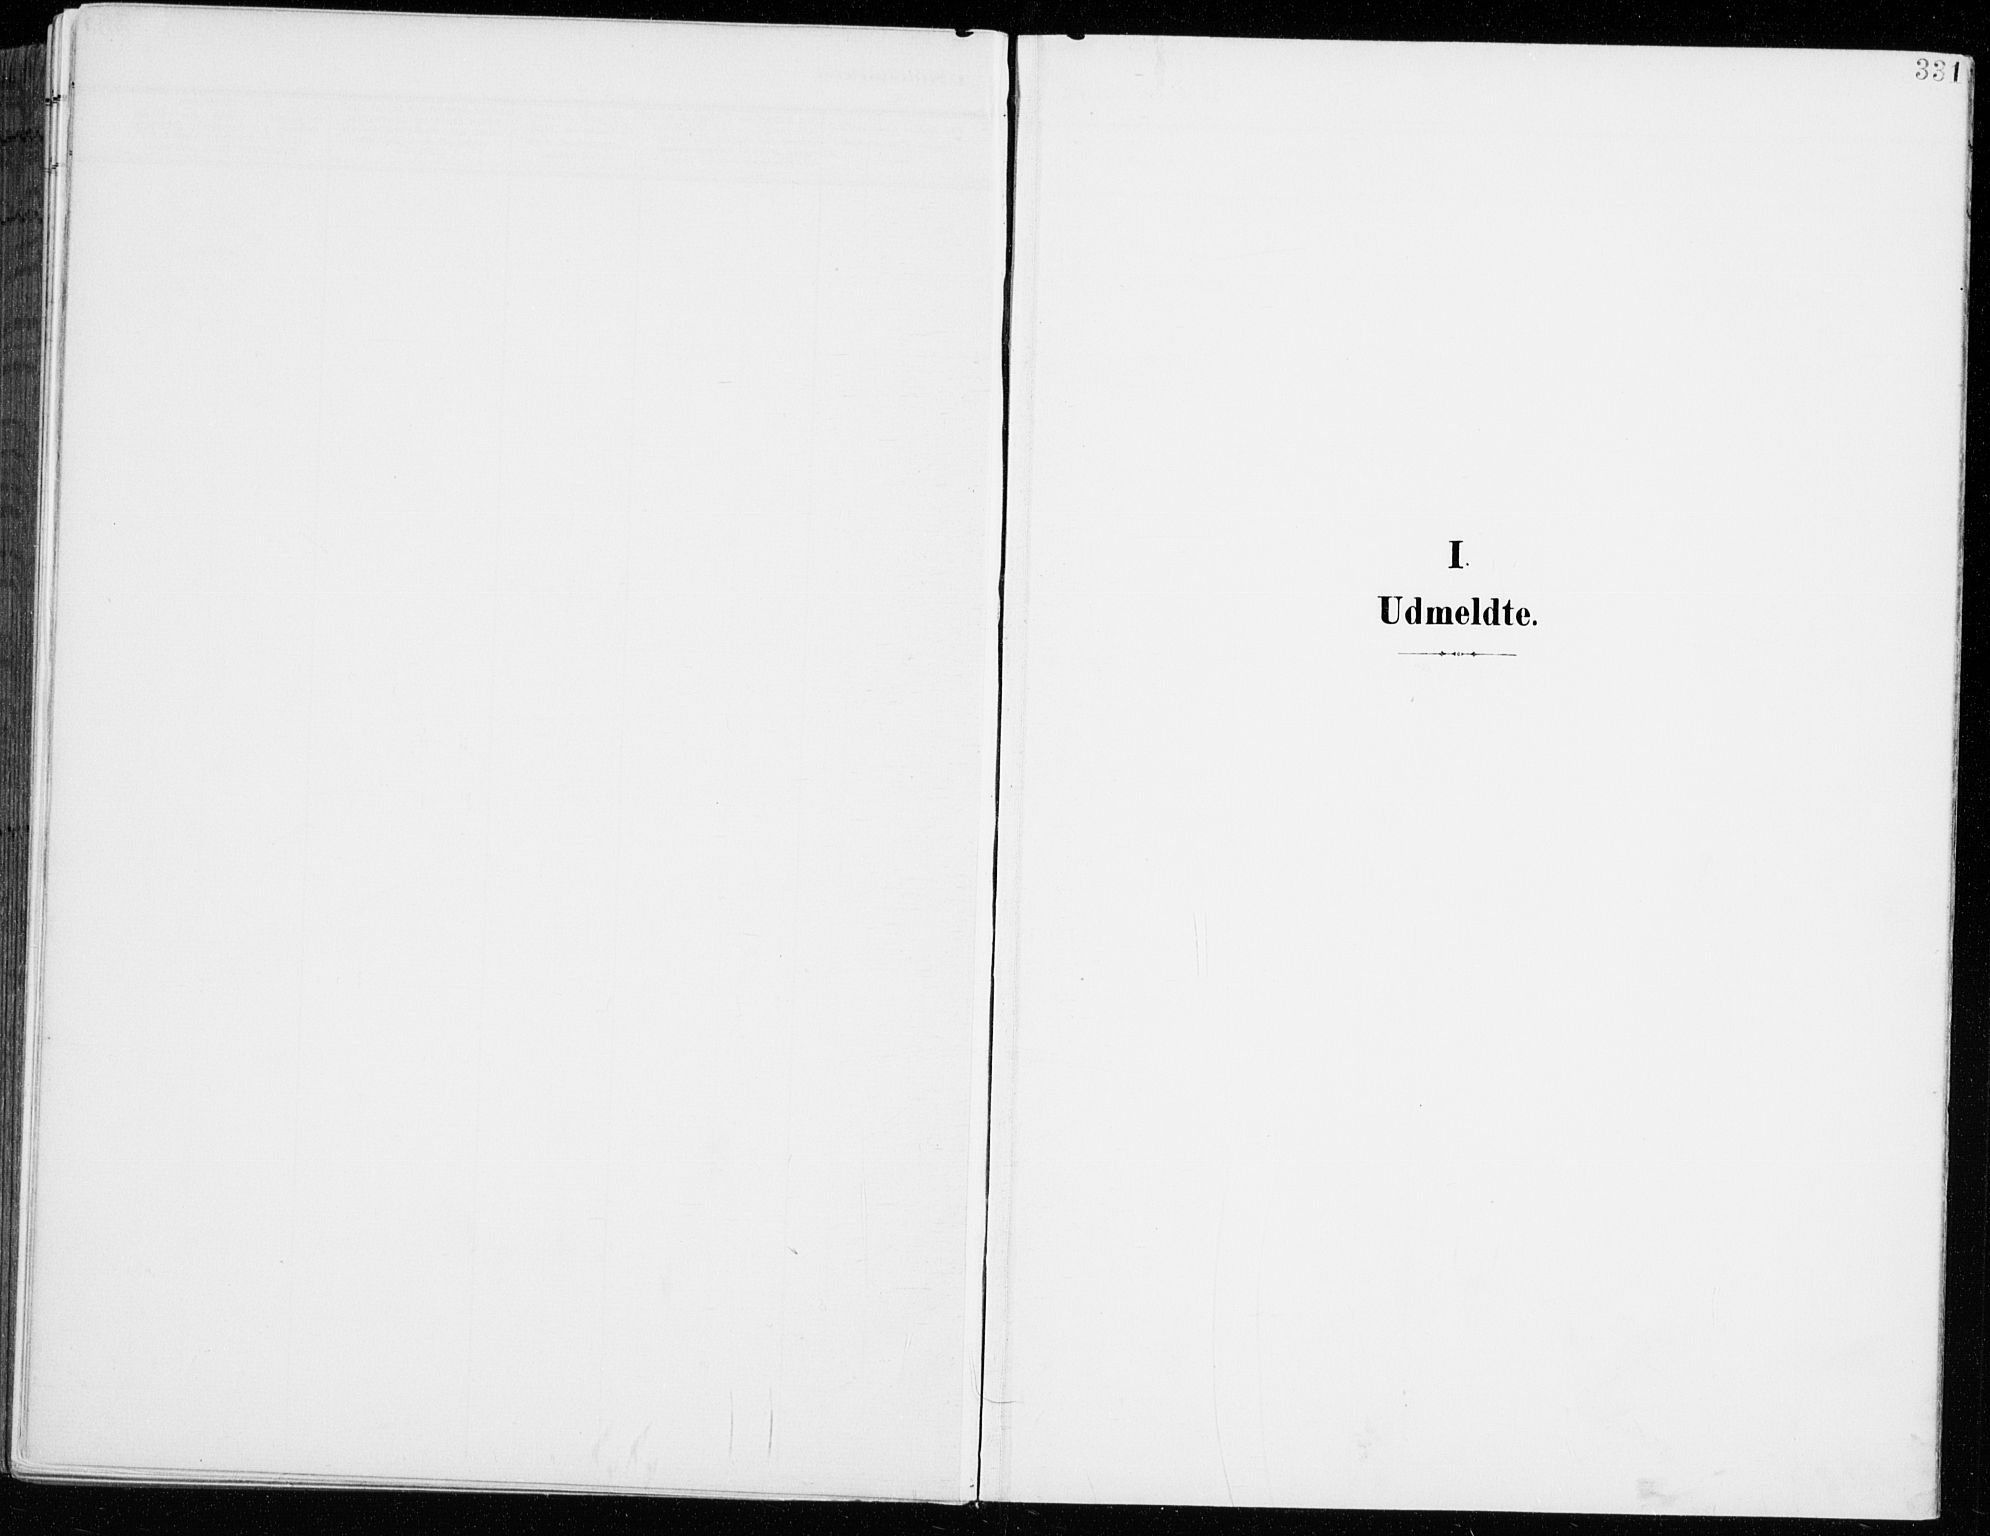 SAH, Fåberg prestekontor, H/Ha/Haa/L0011: Ministerialbok nr. 11, 1899-1913, s. 331